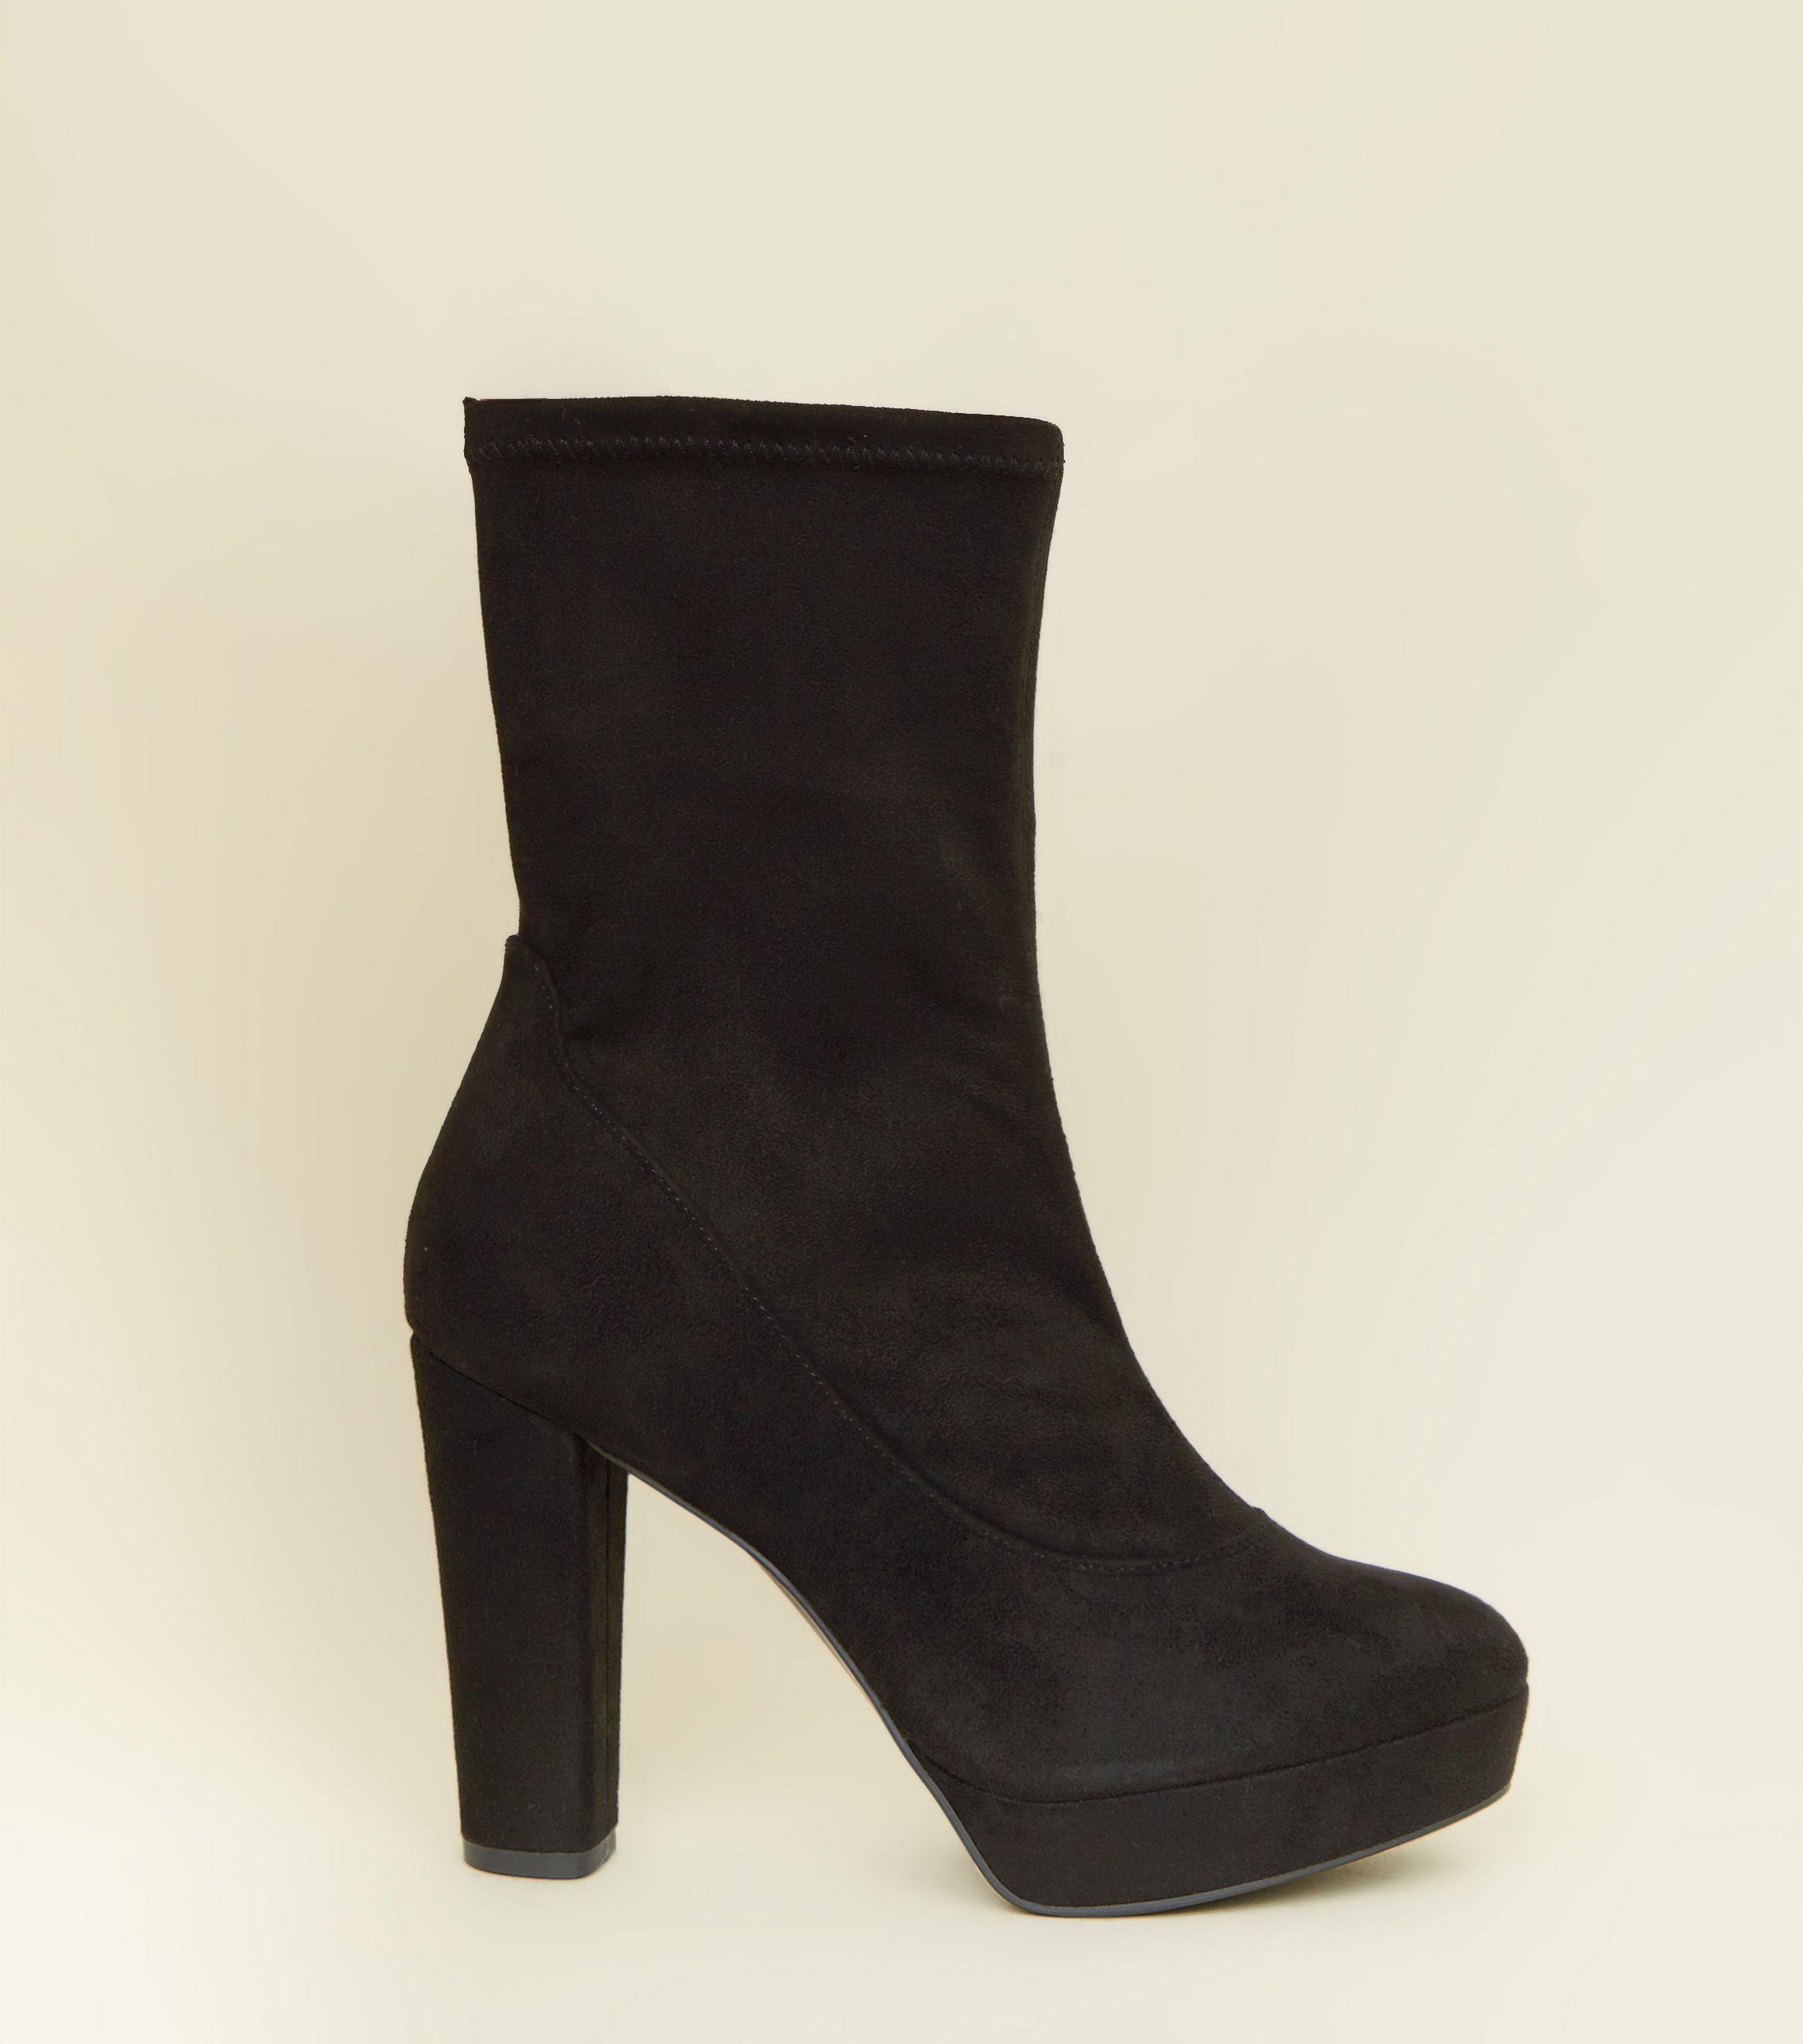 cb65ae9226 New Look Wide Fit Black Suedette Block Heel Platform Boots in Black ...